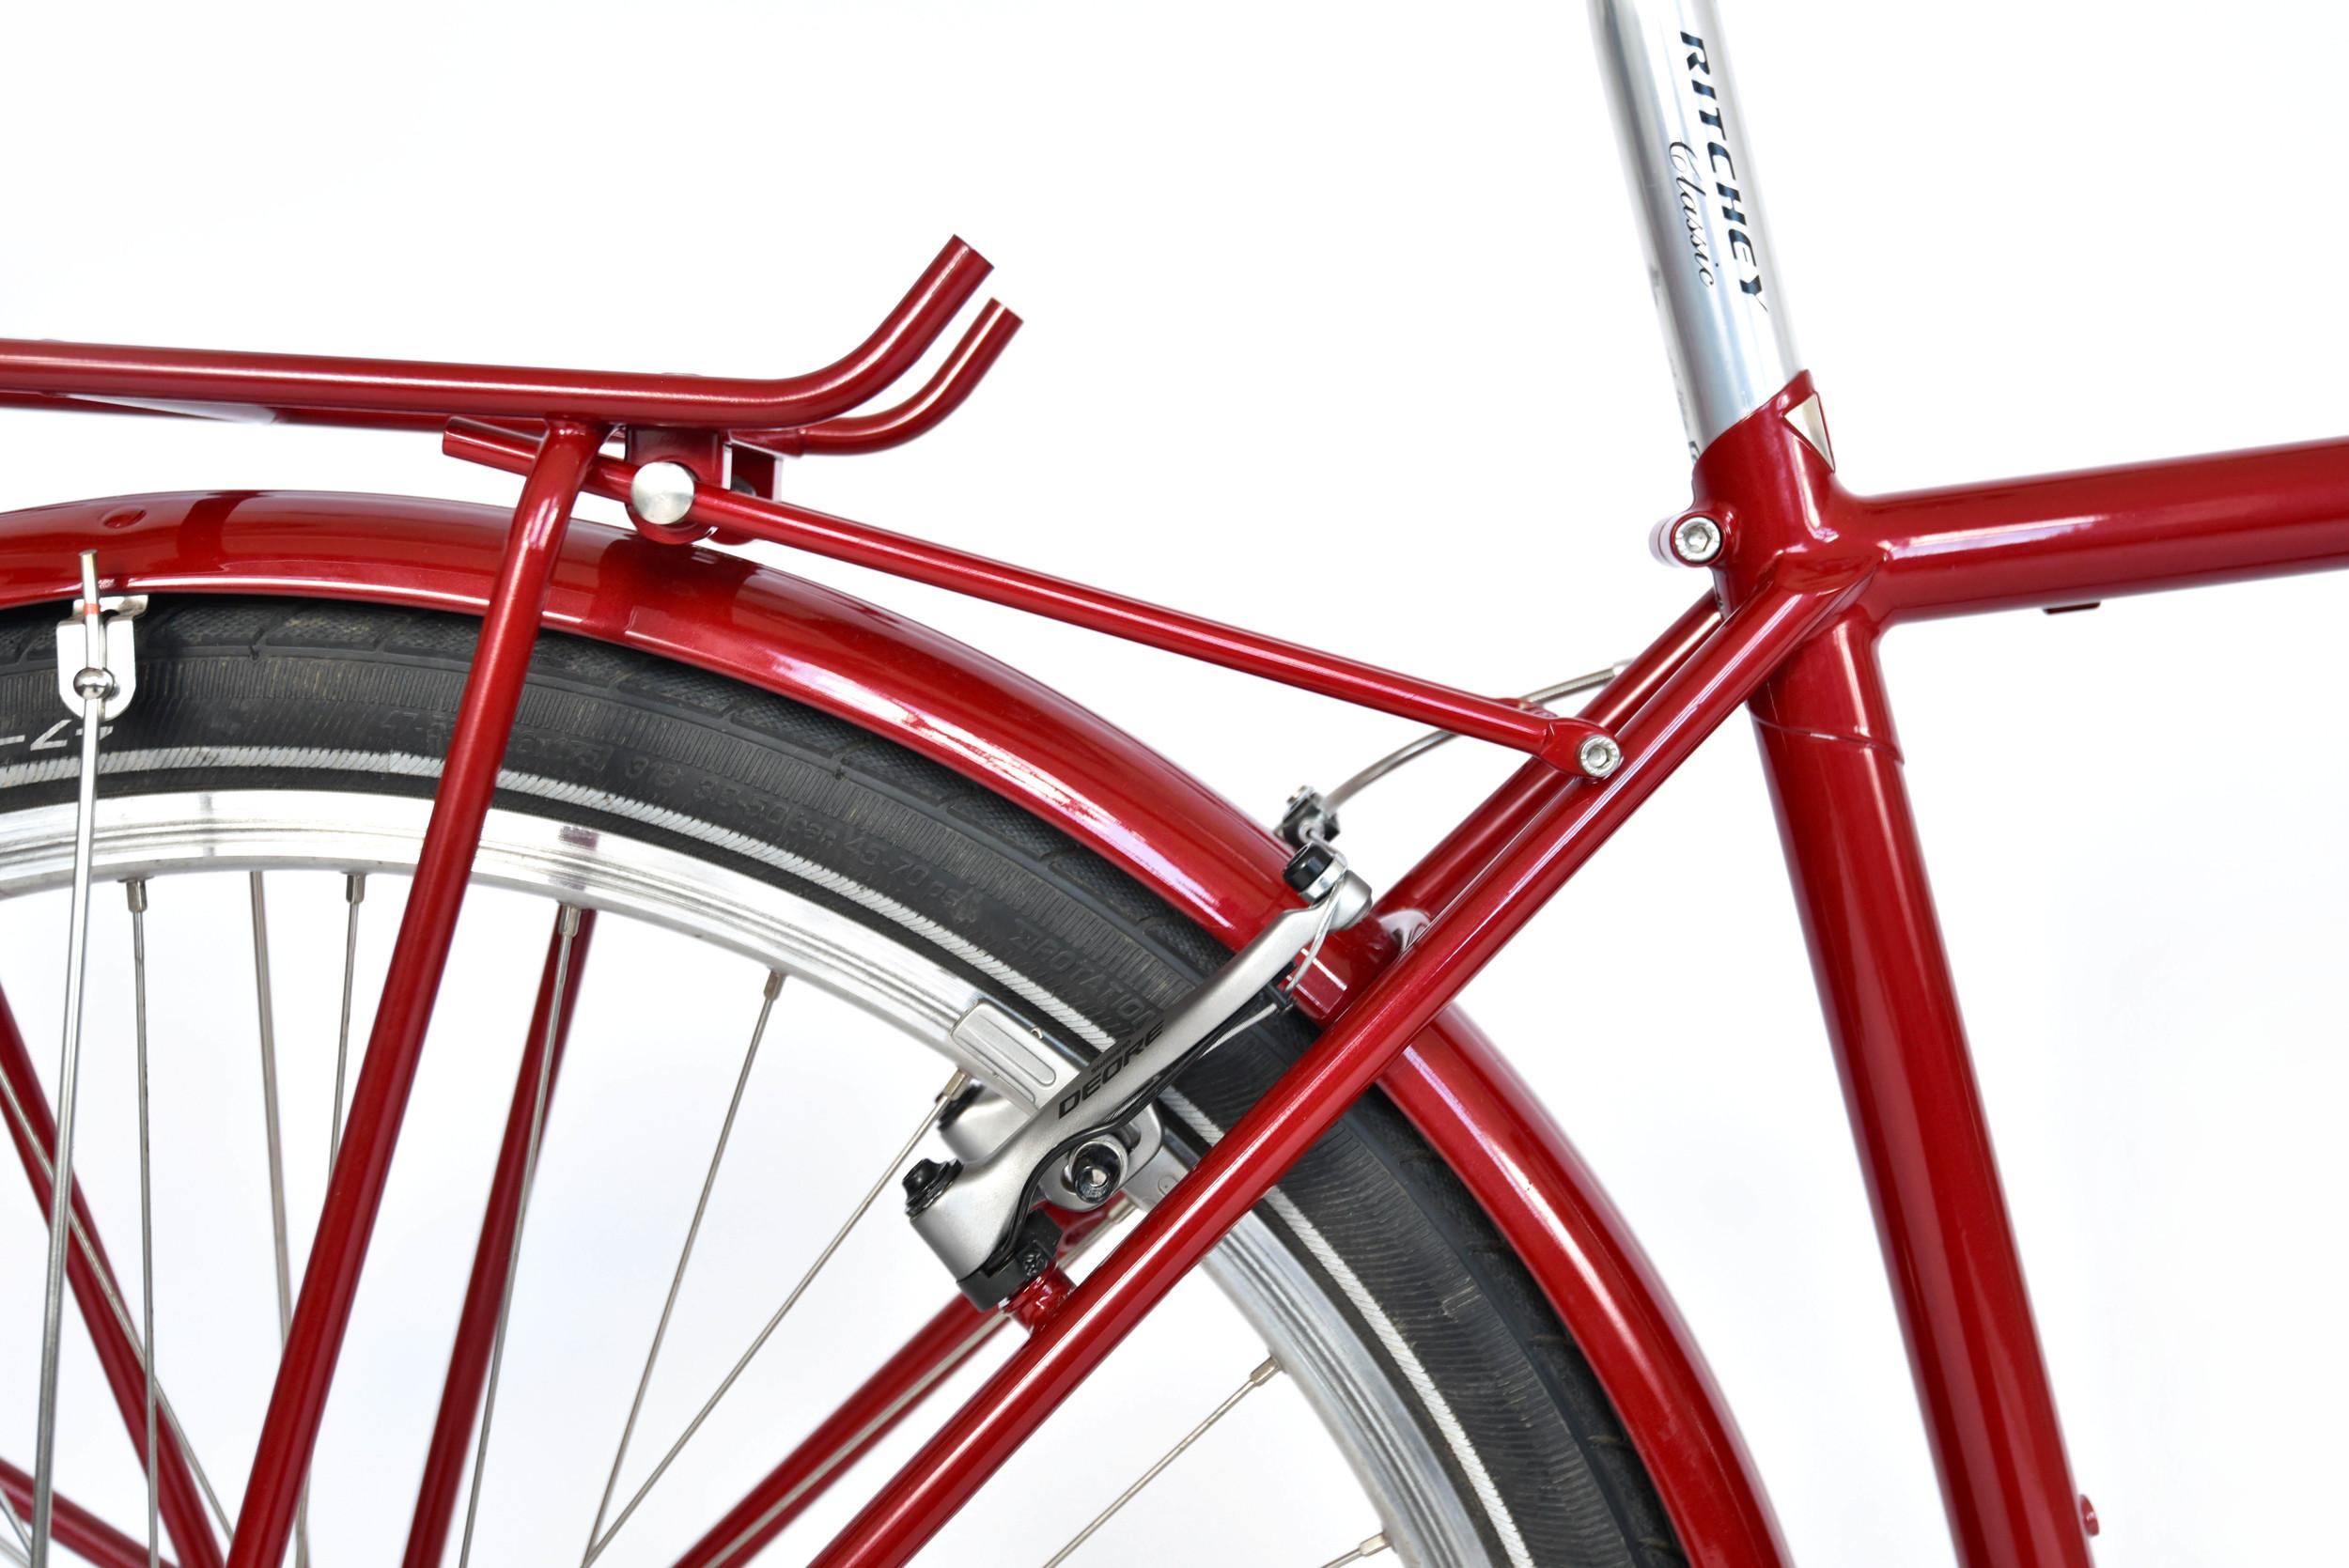 853 mini touring bike bespoke seat cluster